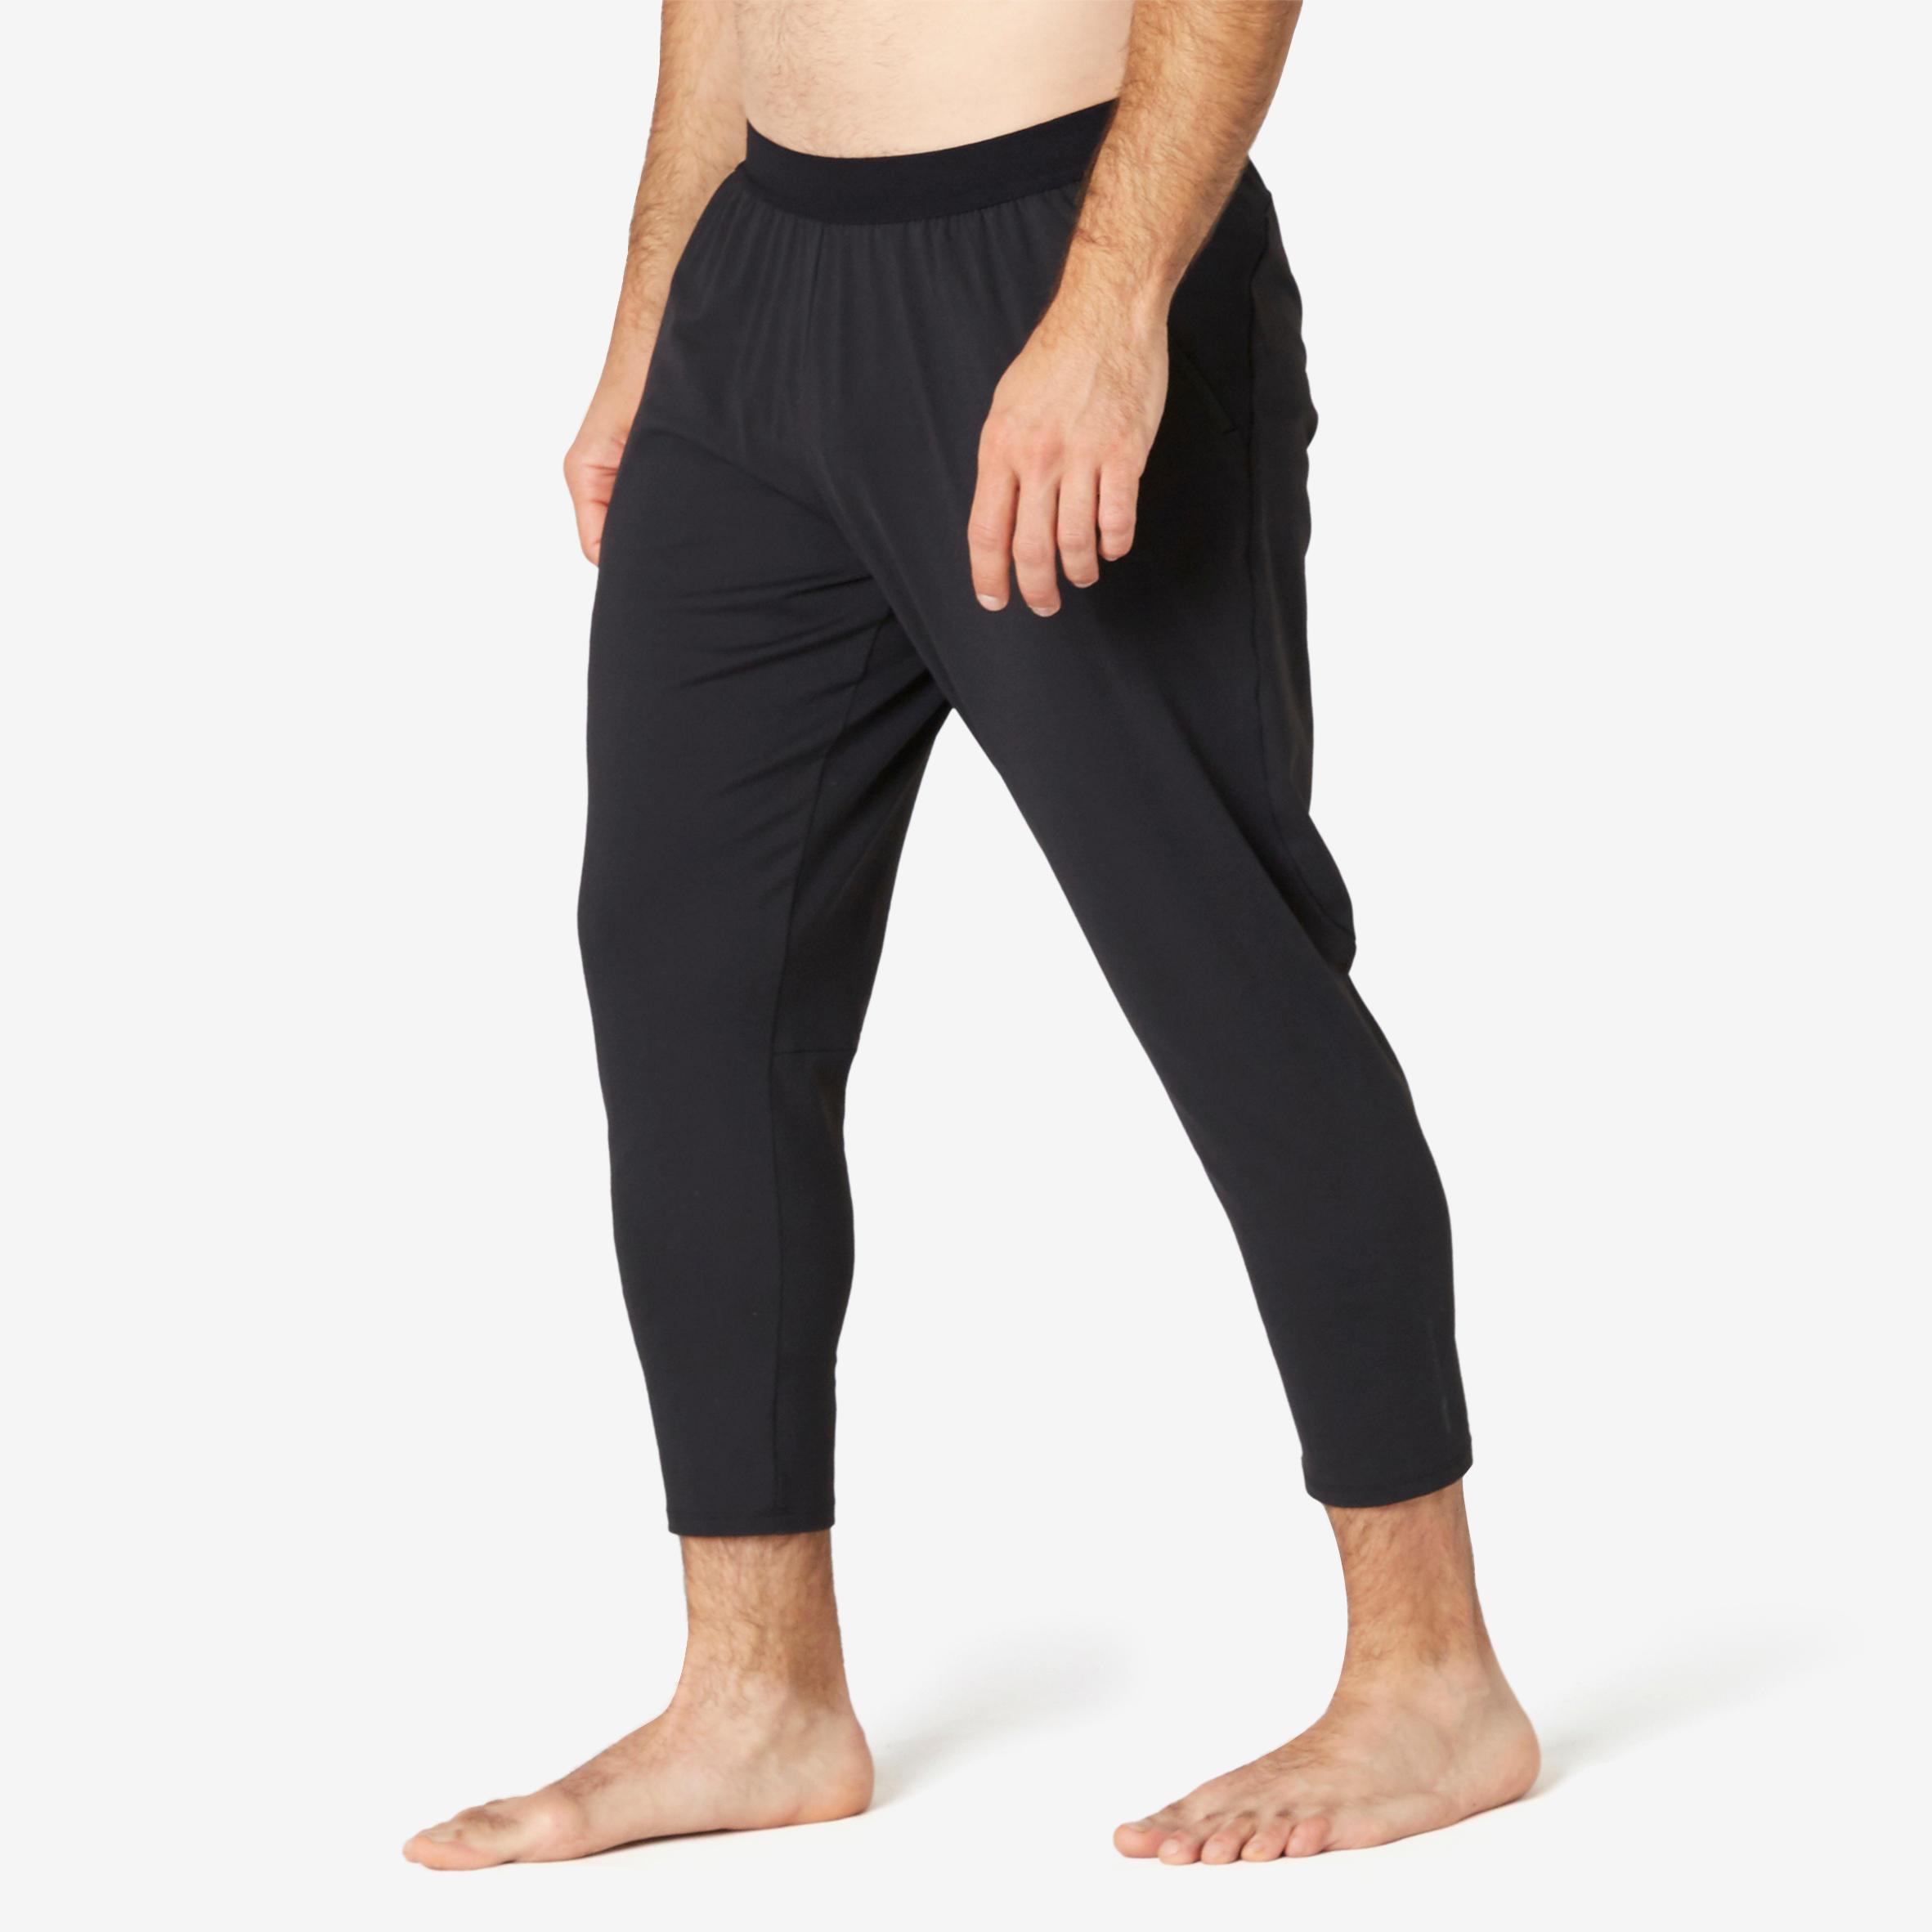 Pantalon skinny 7/8 900 imagine